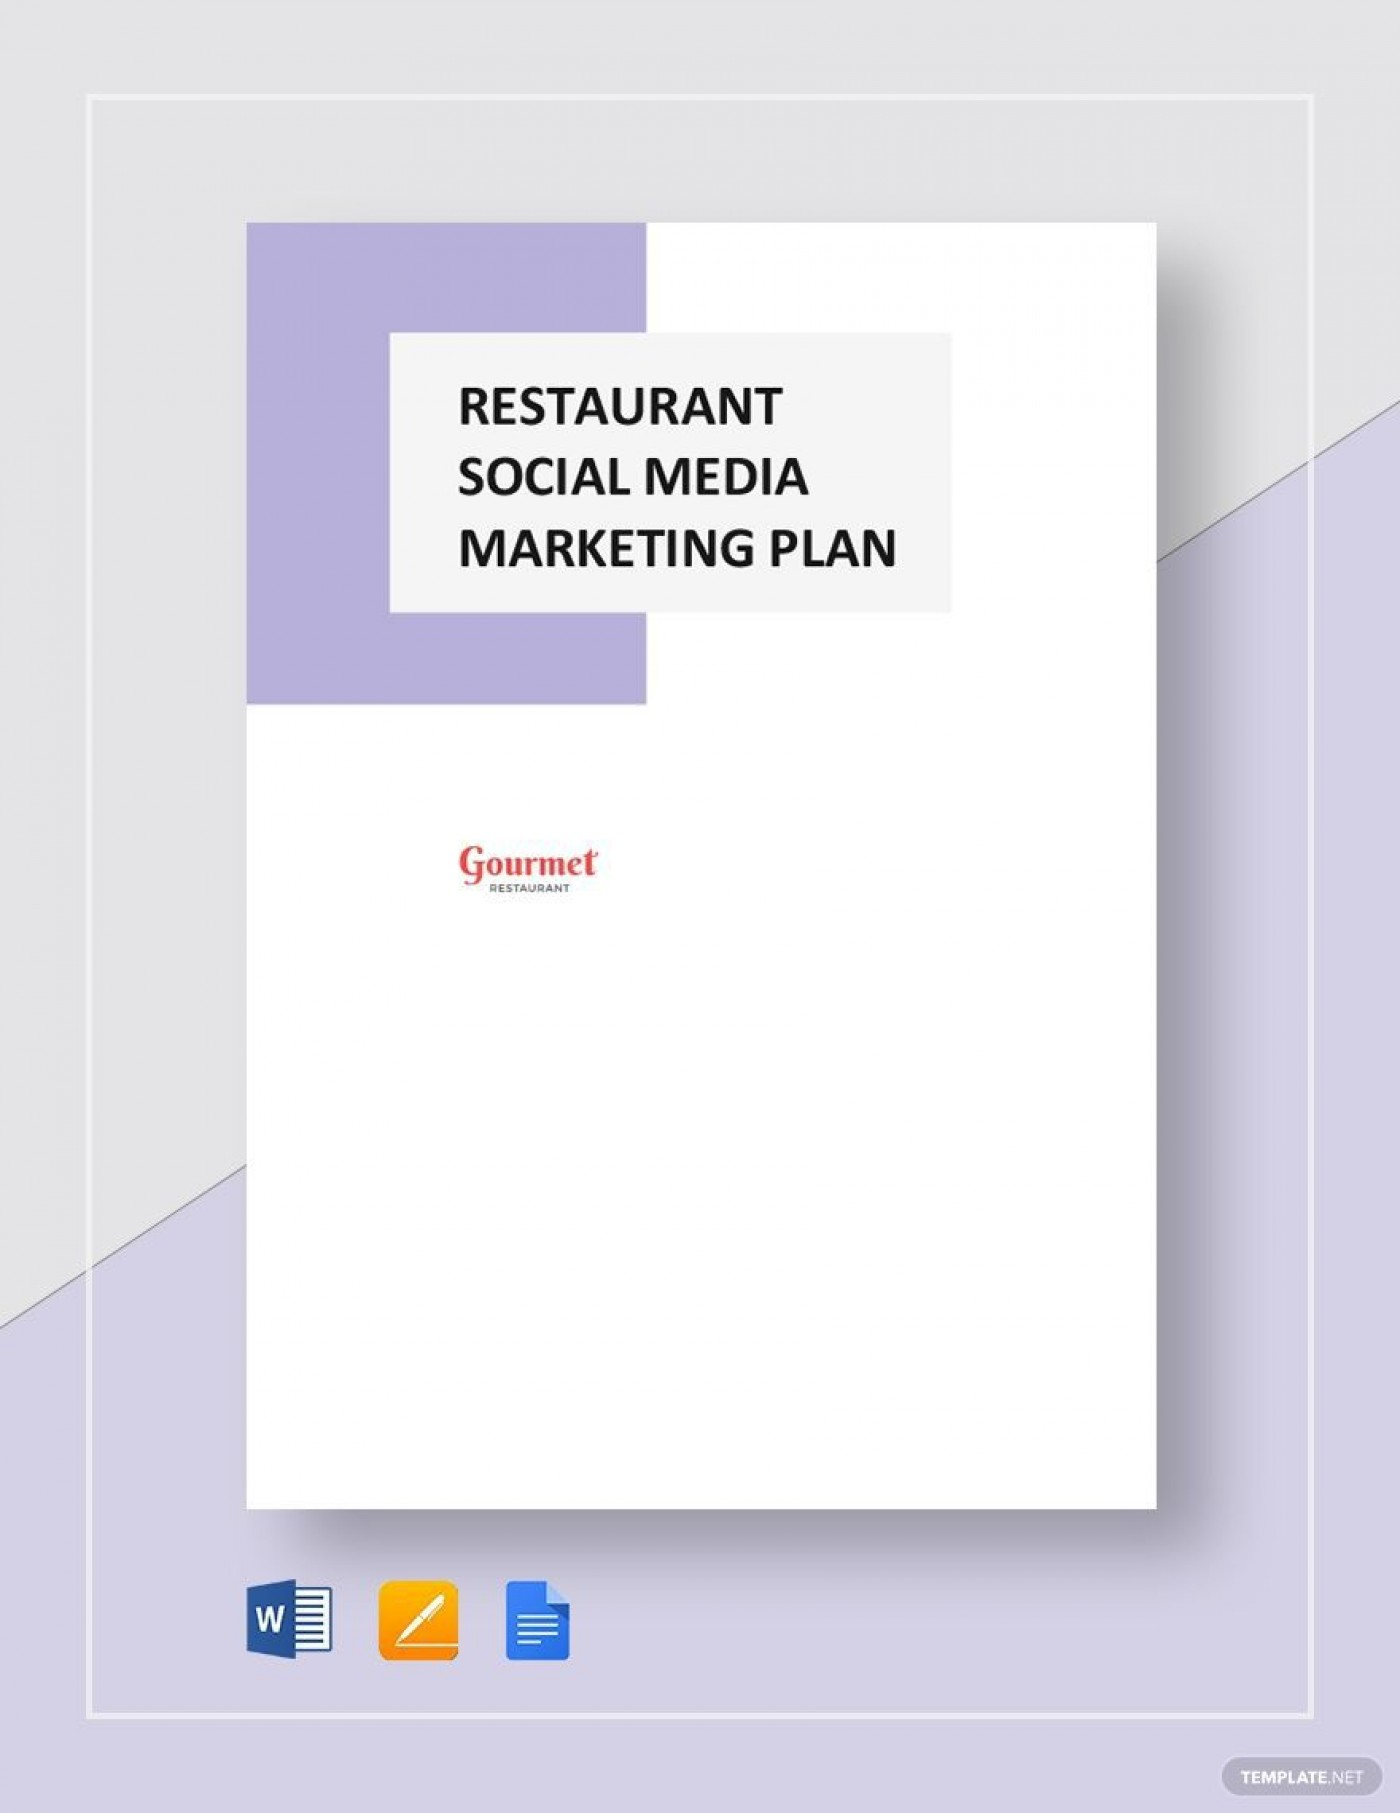 004 Impressive Social Media Marketing Plan Template Doc Highest Clarity 1400